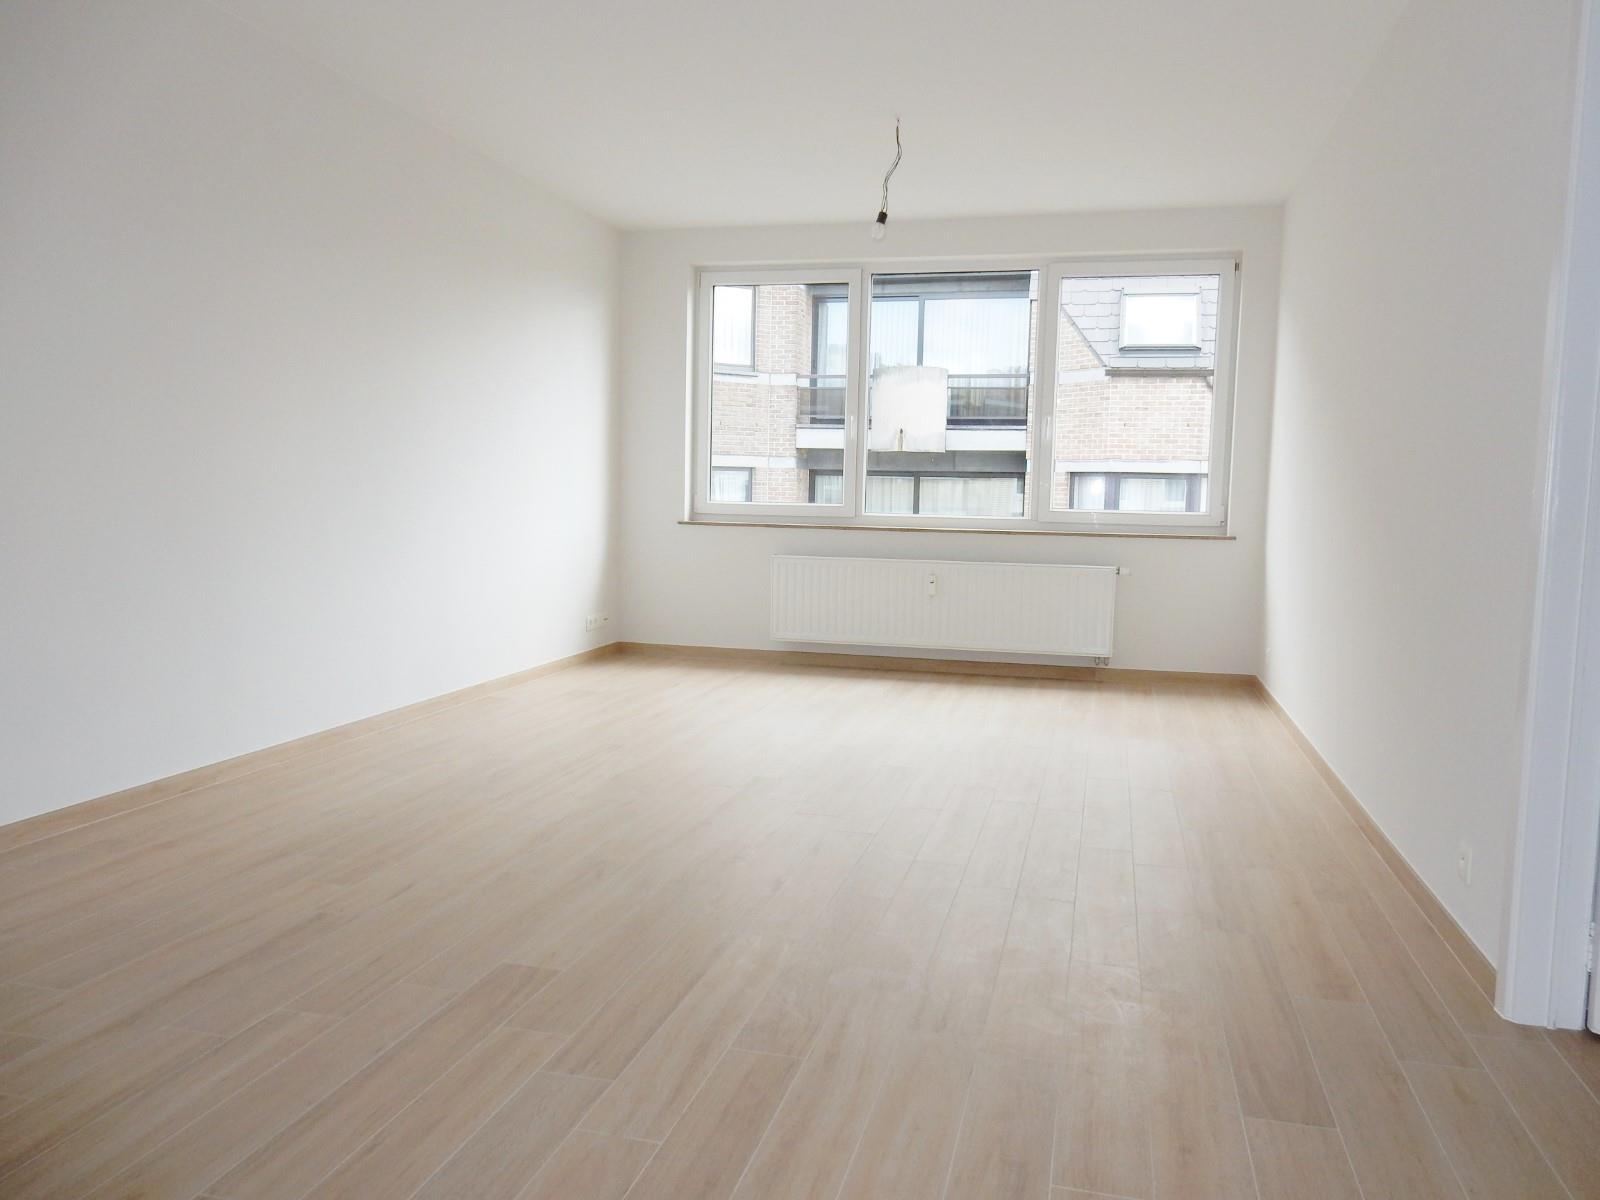 Appartement - Auderghem - #3071645-0